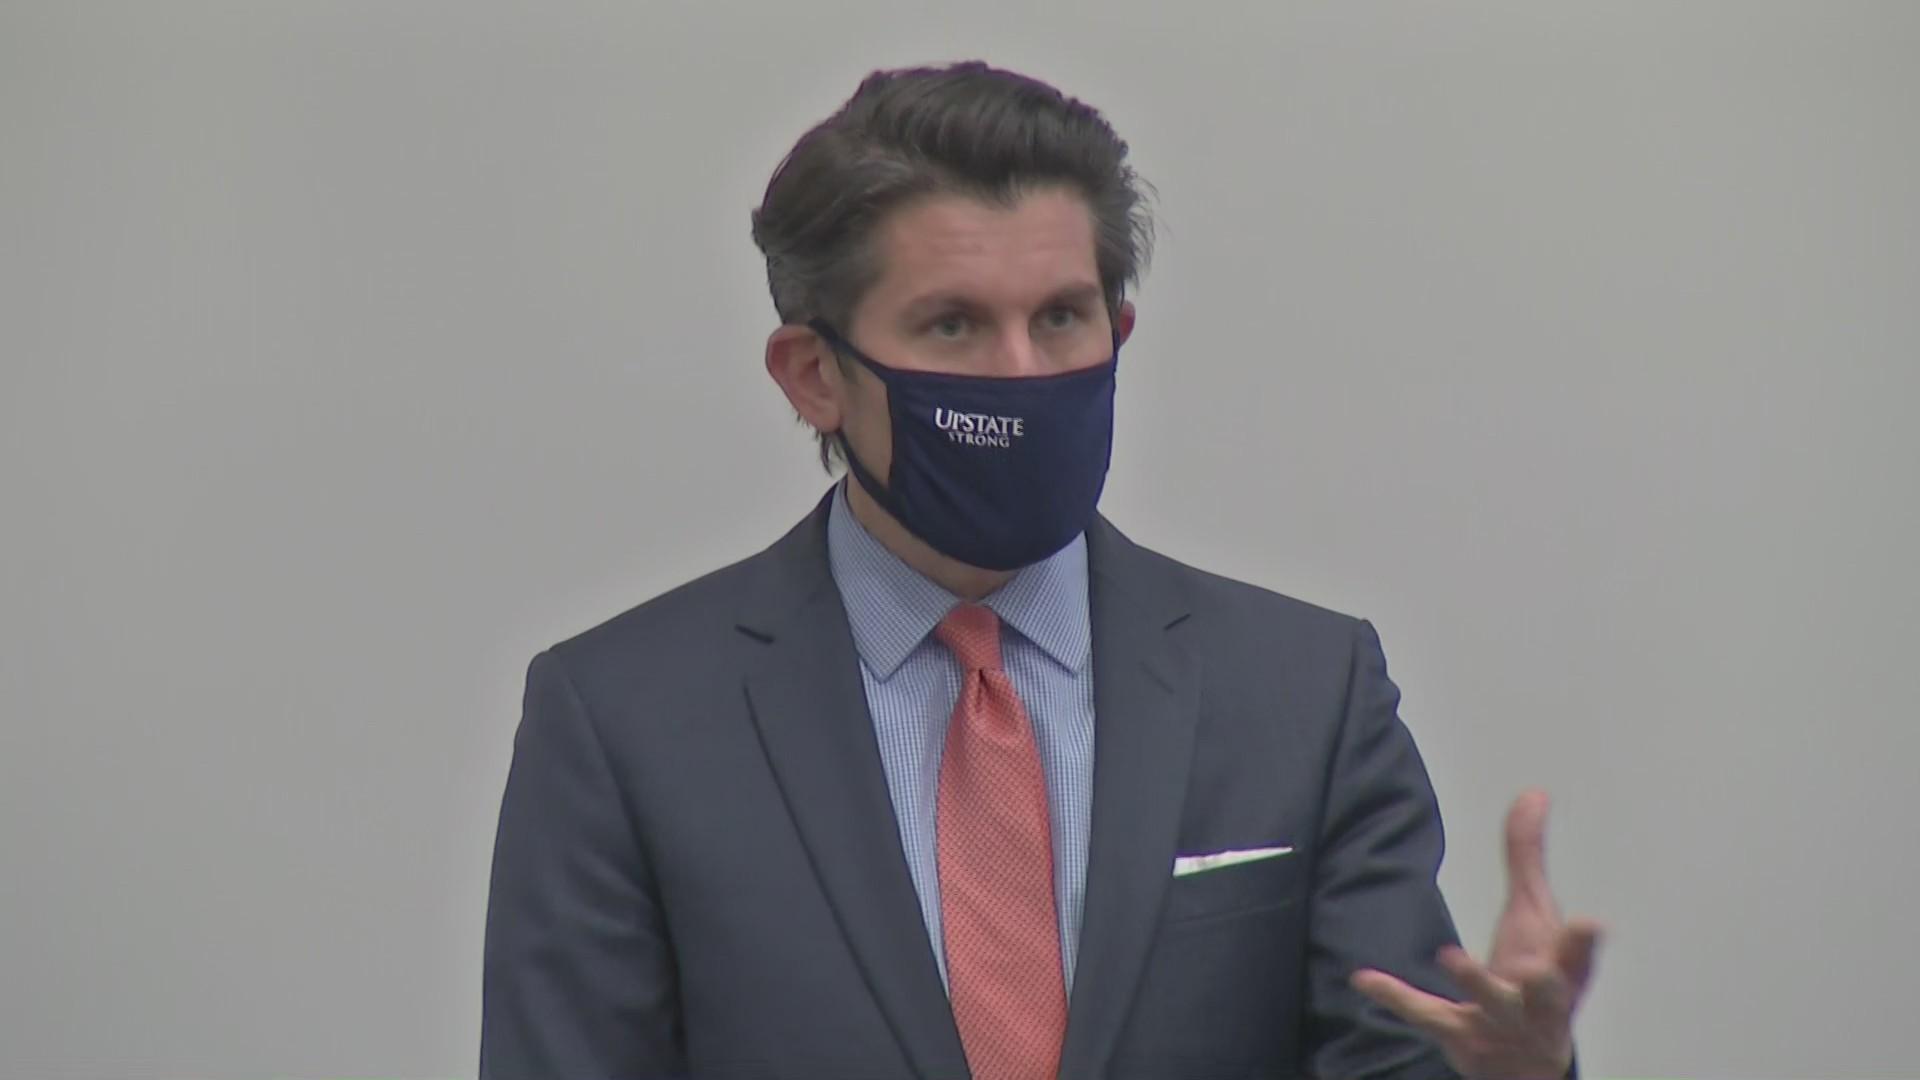 SUNY Chancellor Jim Malatras